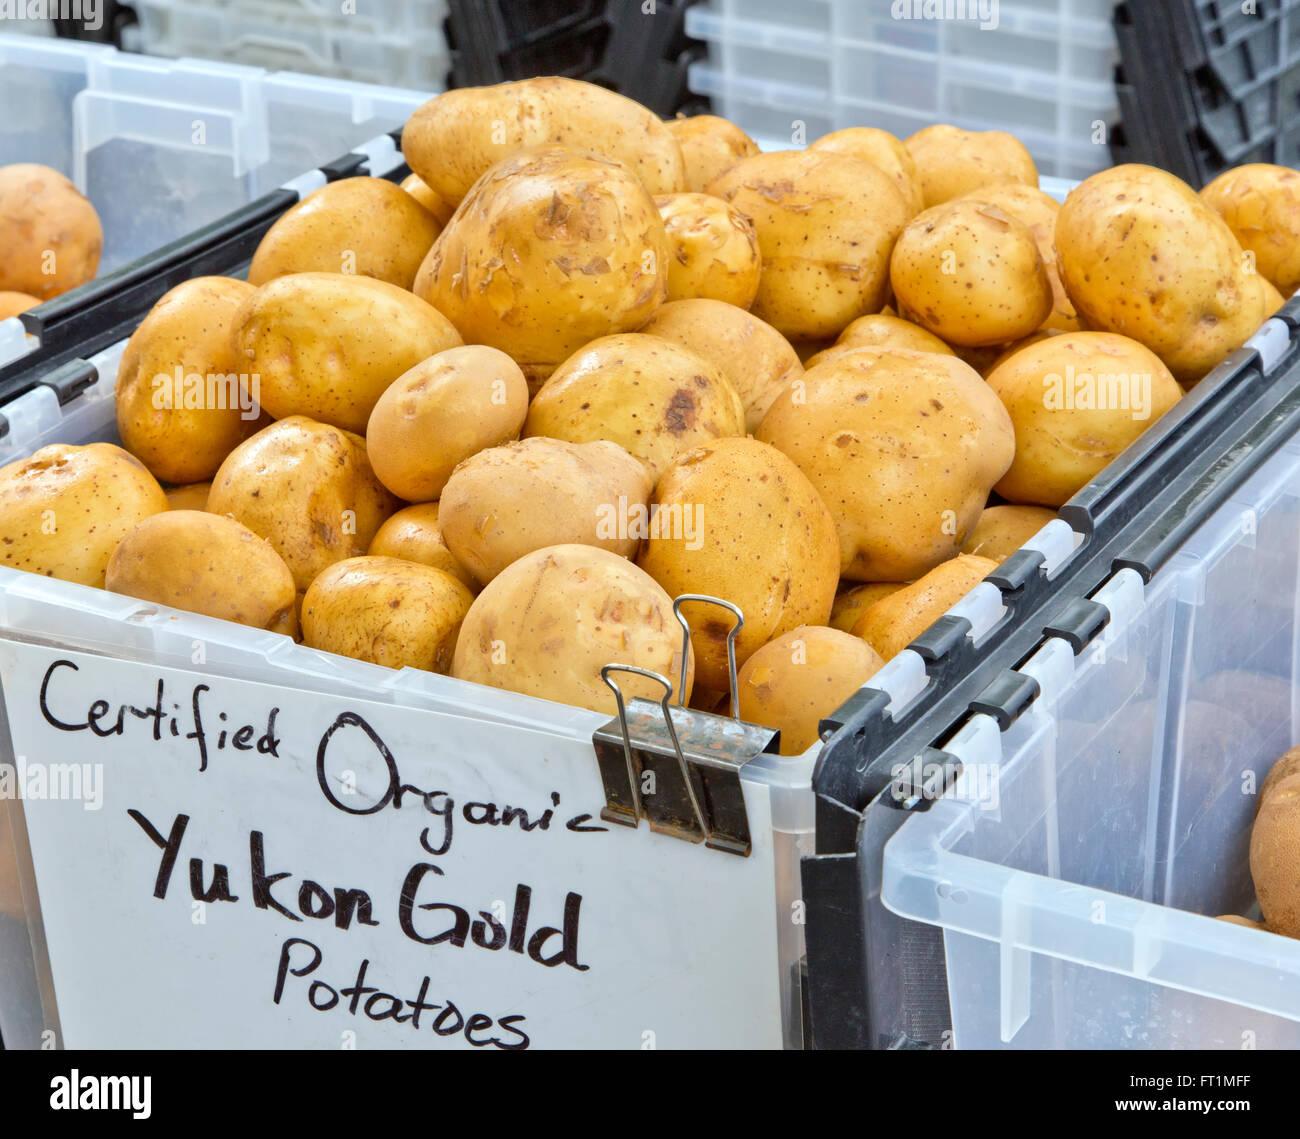 Organic potatoes 'Yukon Gold', Anchorage Farmer's Market, 'Solanum tuberosum'. - Stock Image